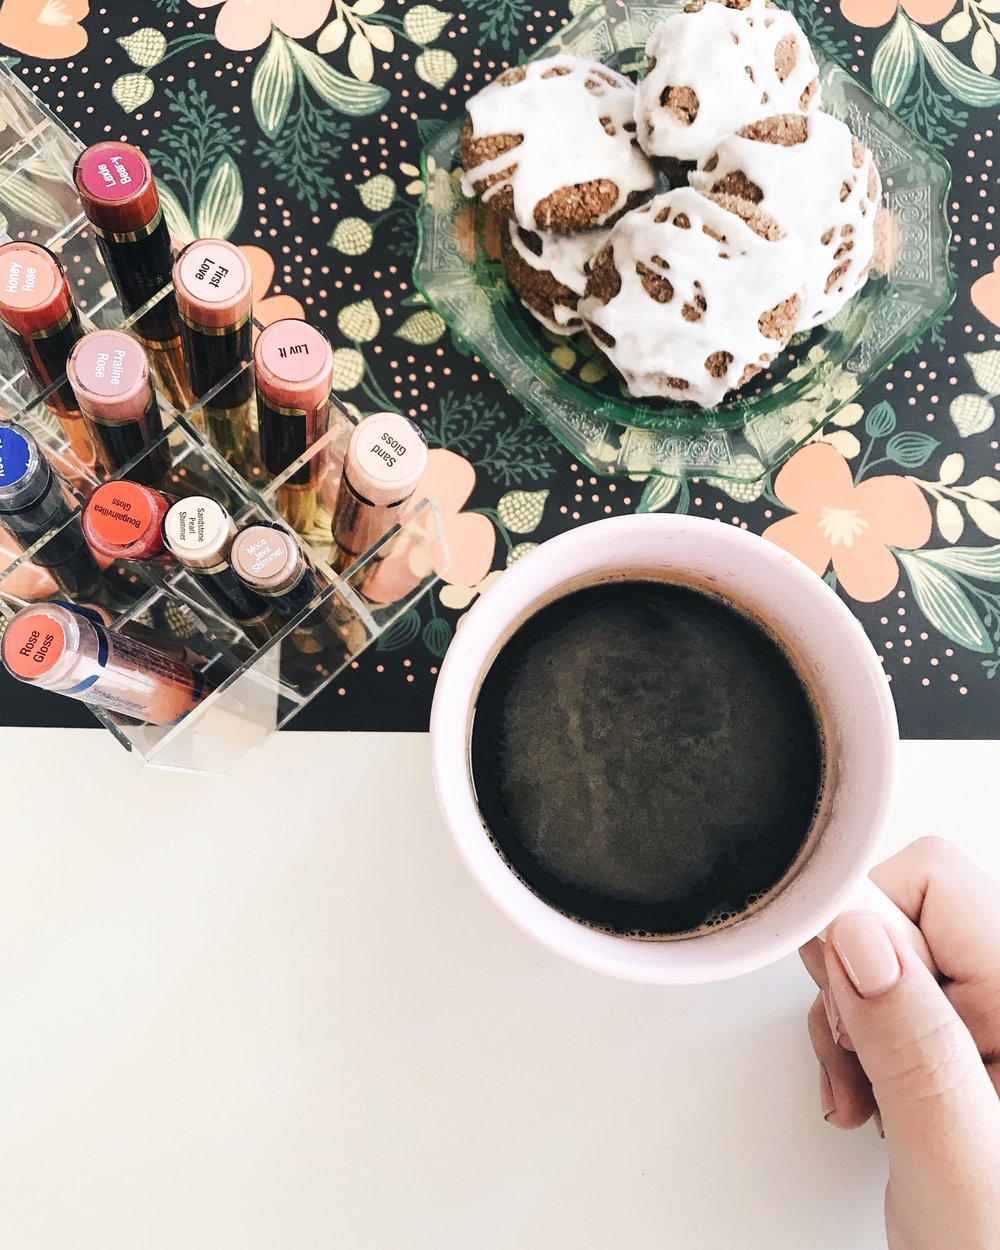 SeneGence LipSense morning coffee